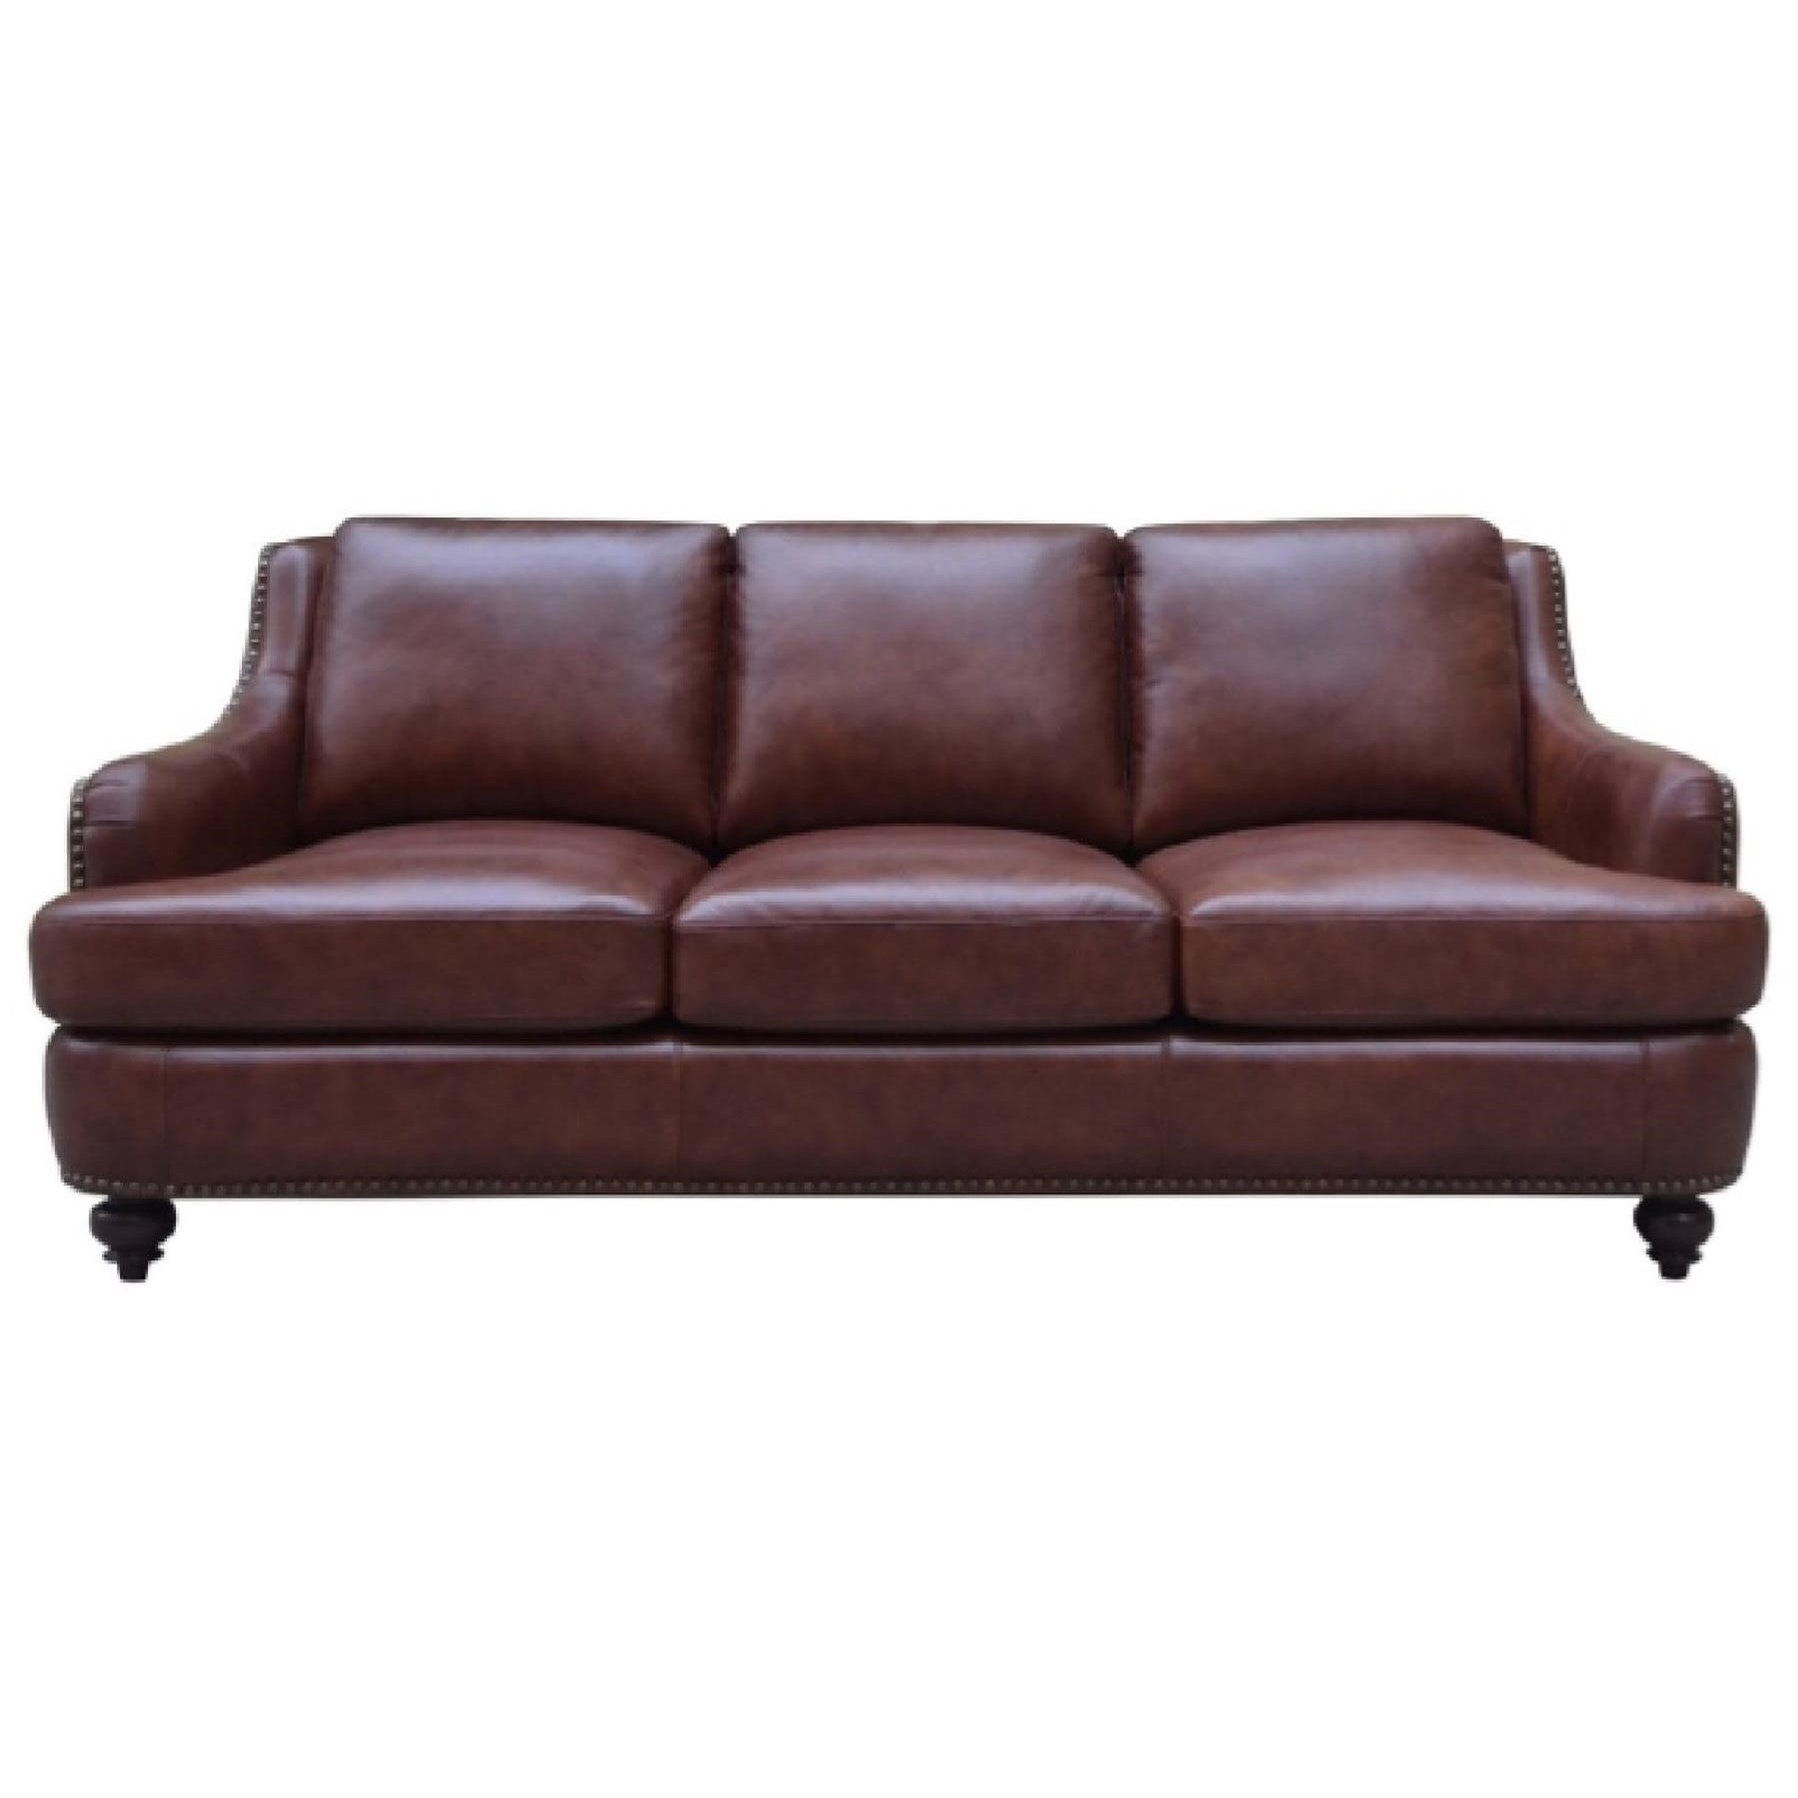 nailhead trim leather sofa set sofas sets uk elements napoli with royal